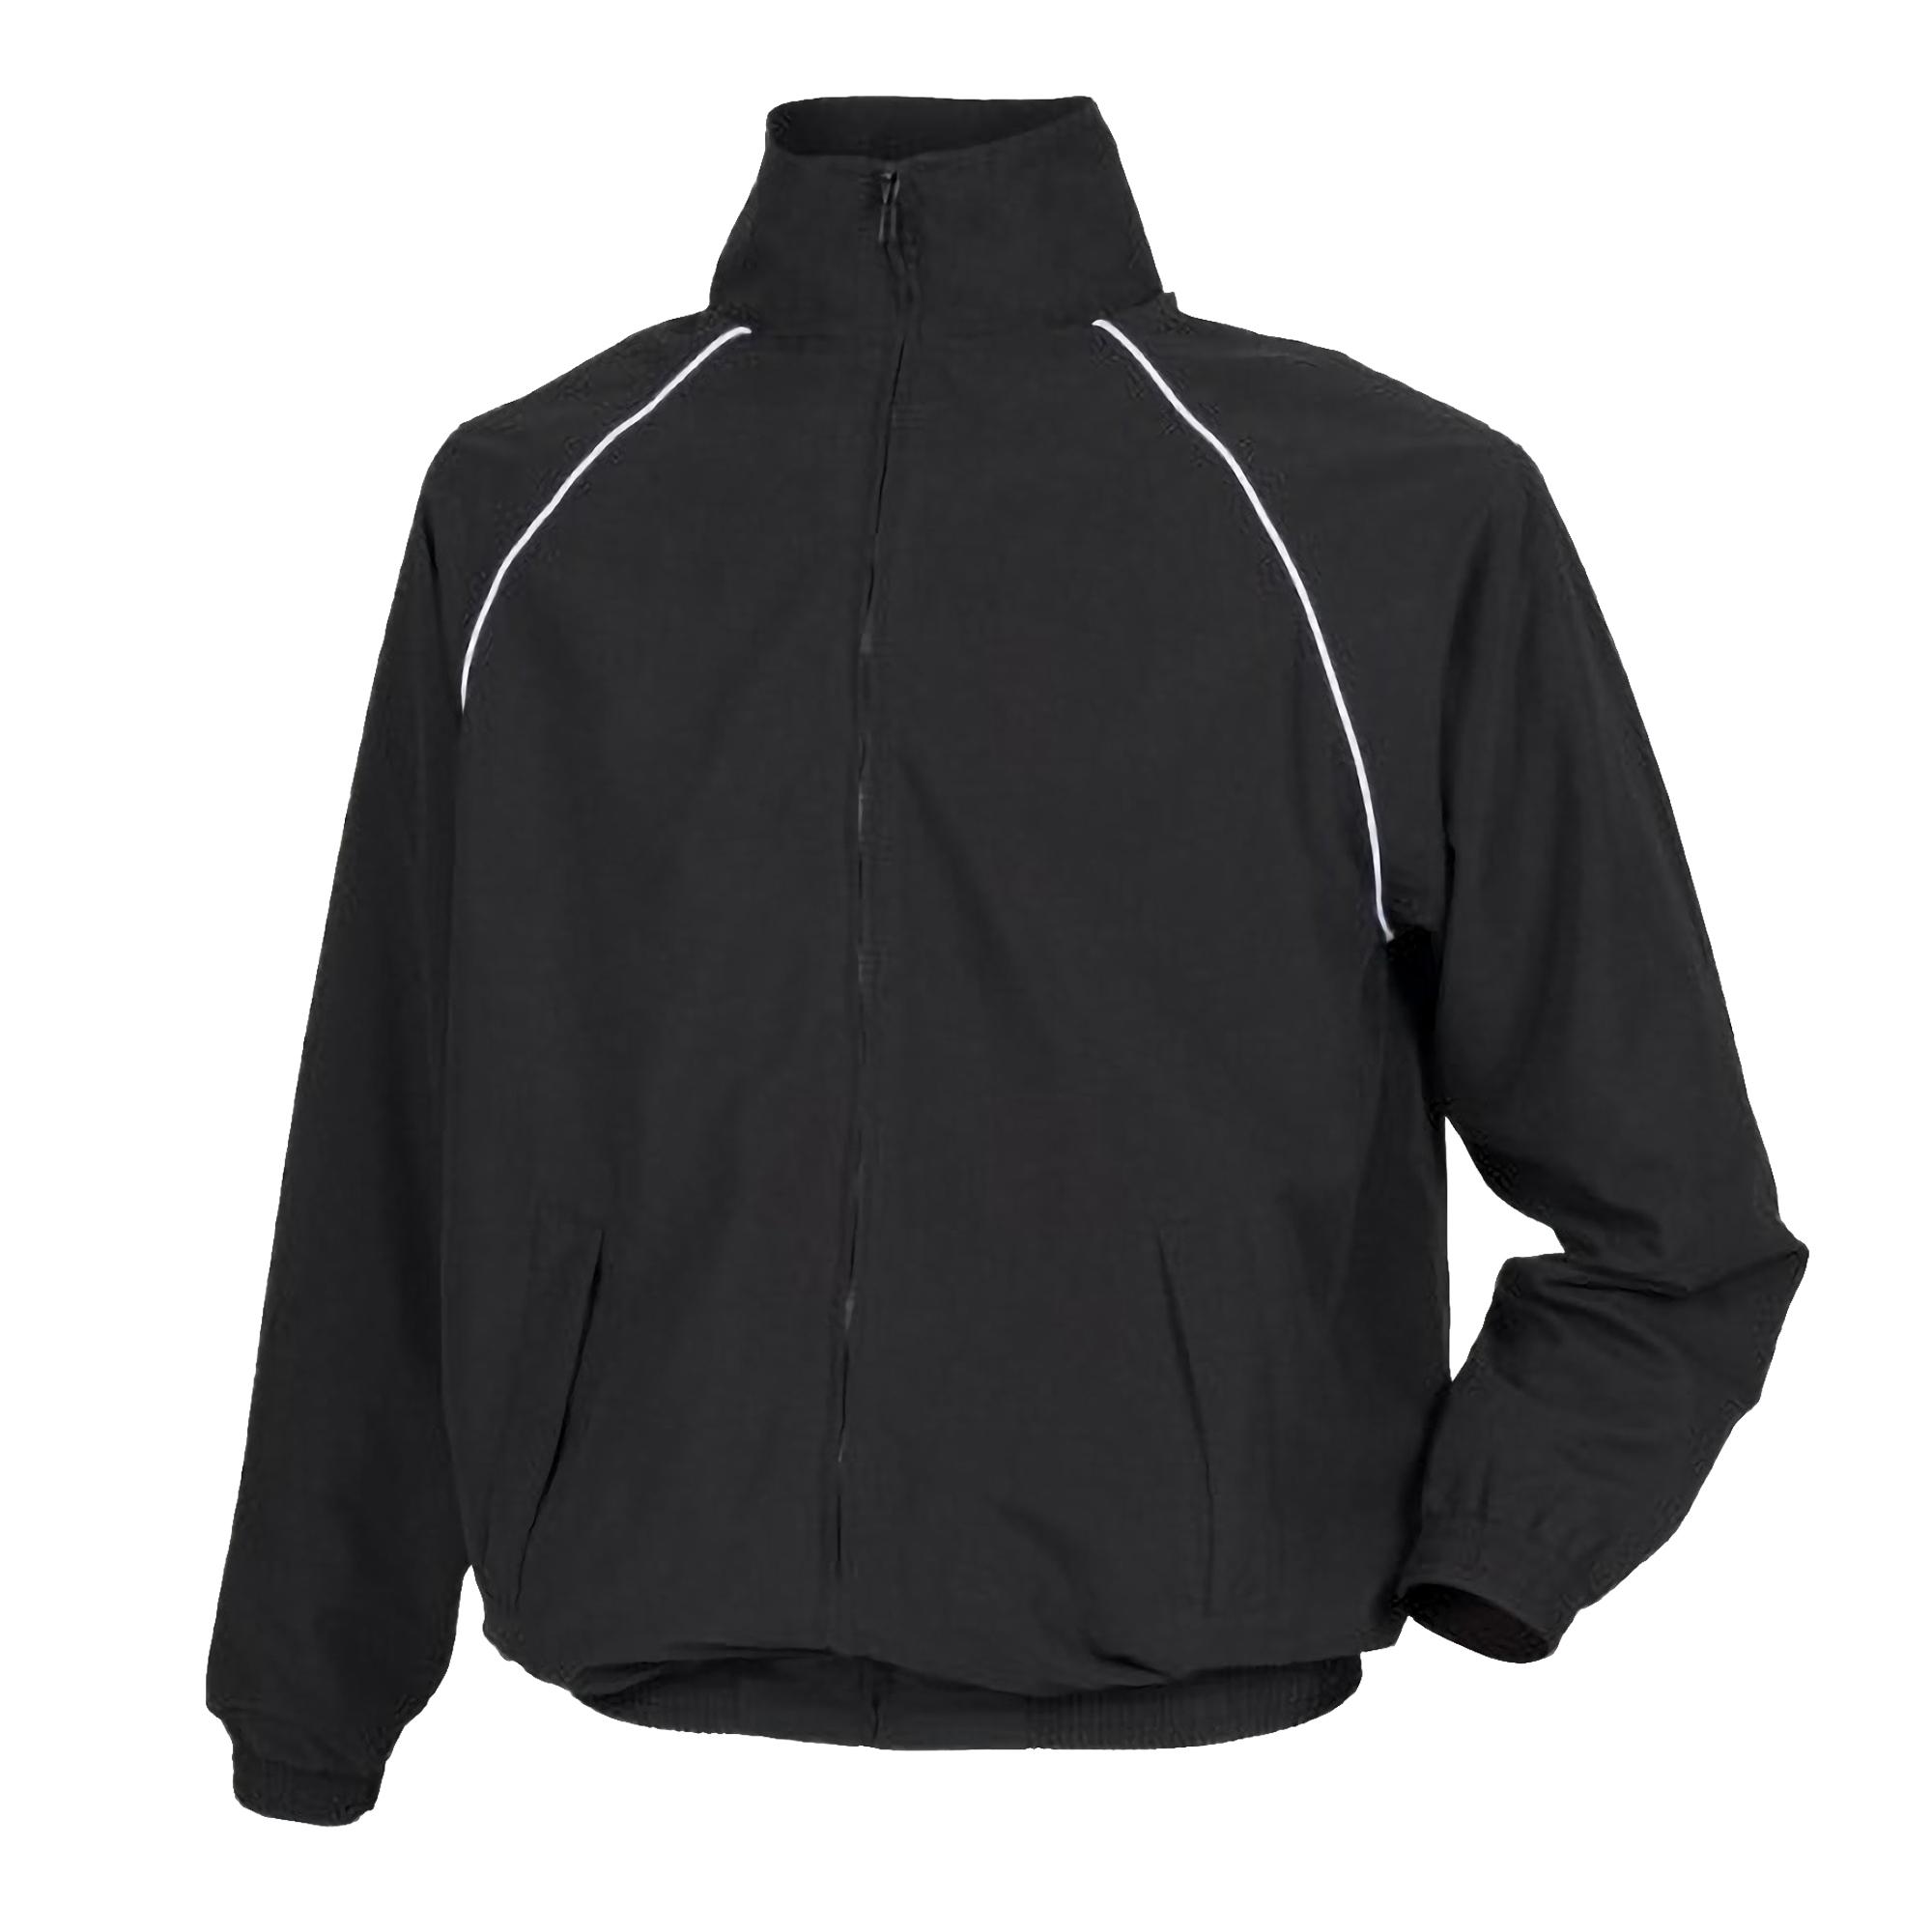 Tombo Mens Teamsport Start Line Sports Training Track Jacket (2XL) (Black/ White piping)